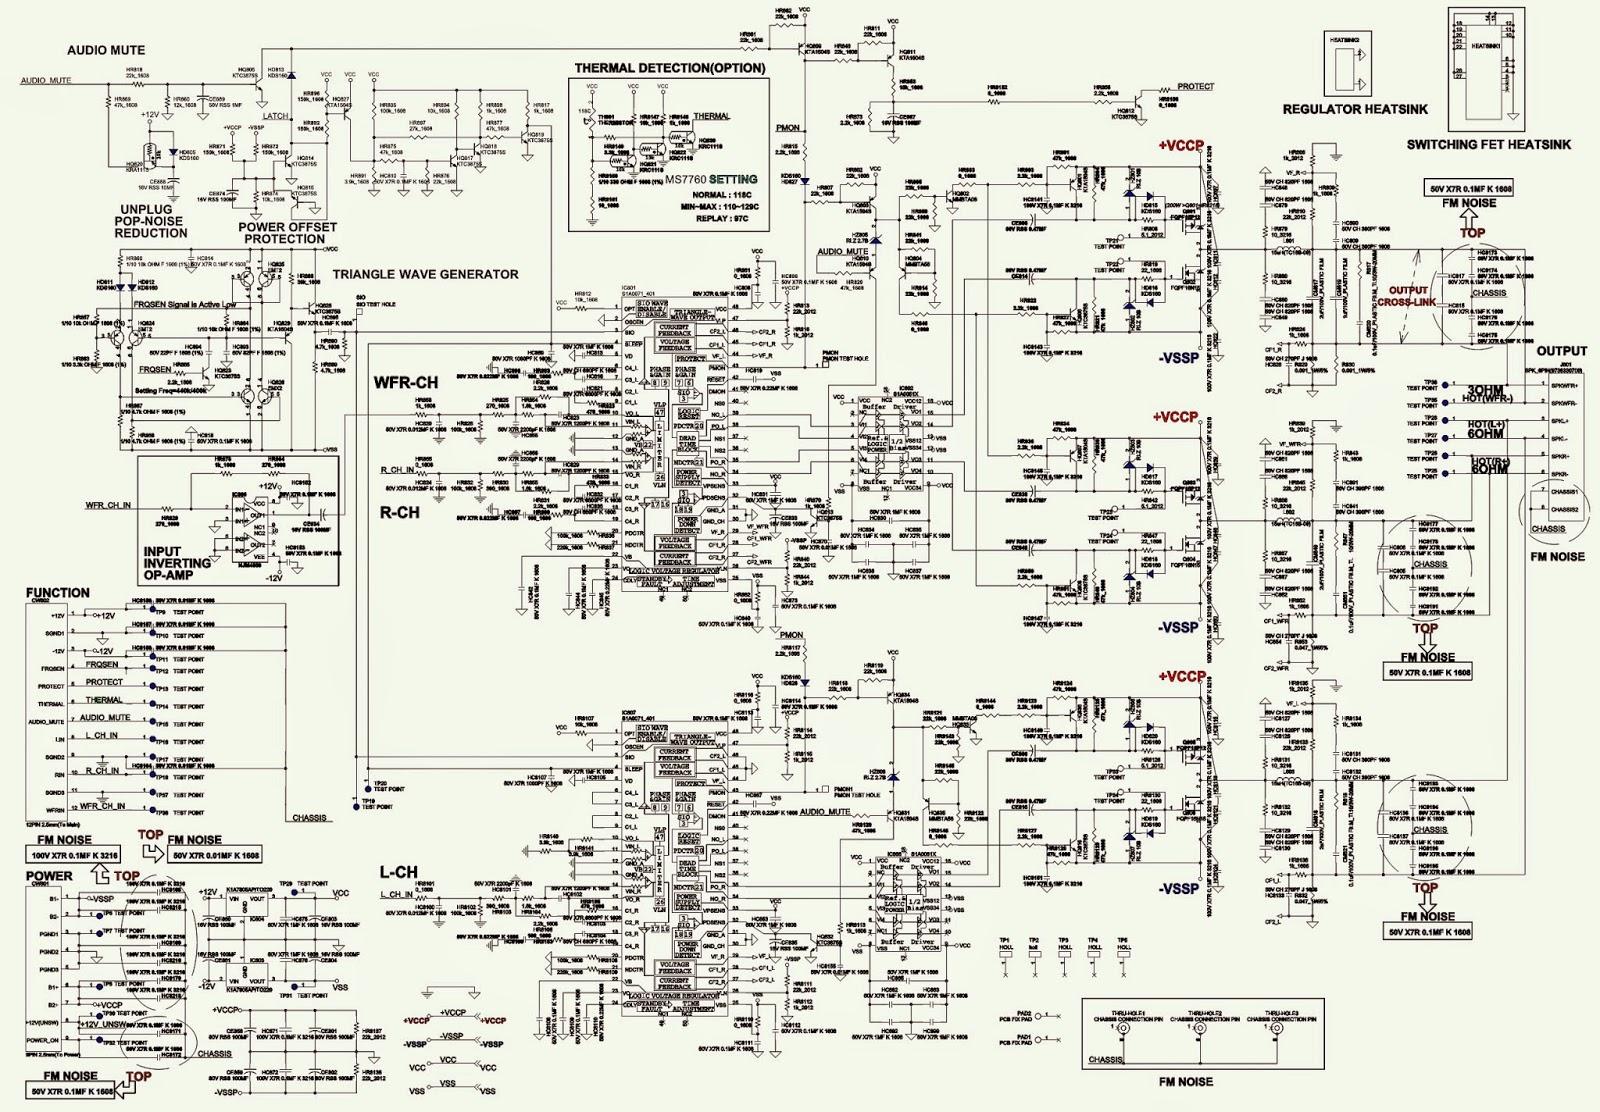 Factory Stereo Wiring Harness Diagram For 1999 Subaru Legacy Auto 2000 Mitsubishi Mirage